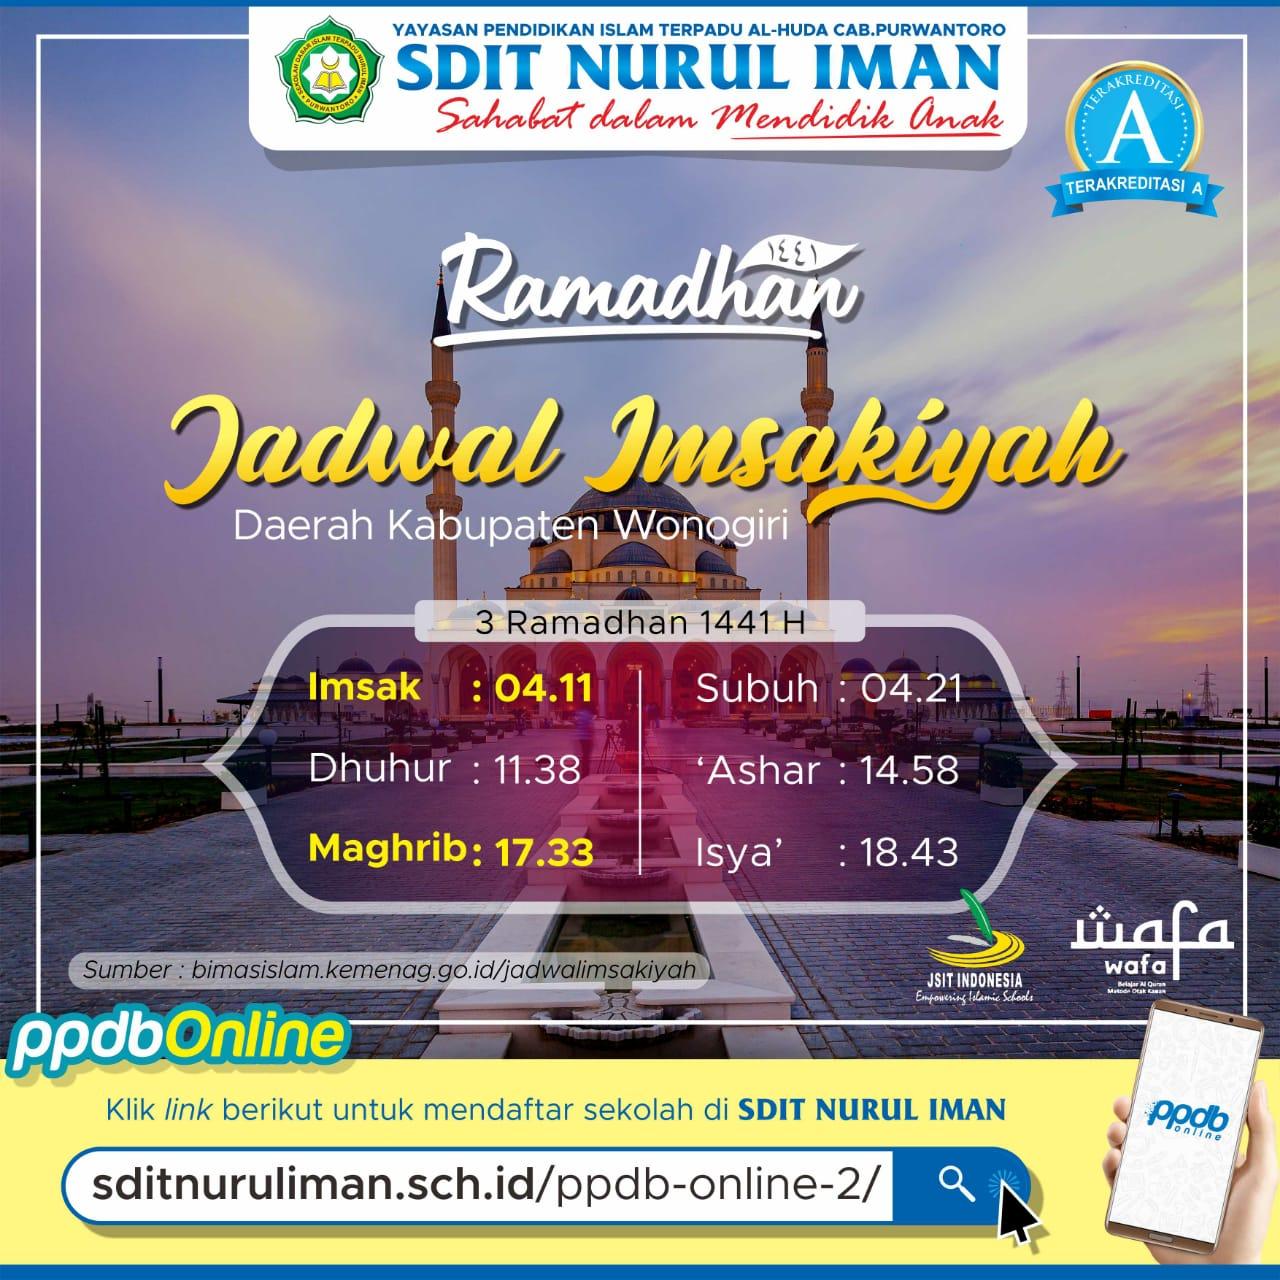 3 Ramadhan 1441 H